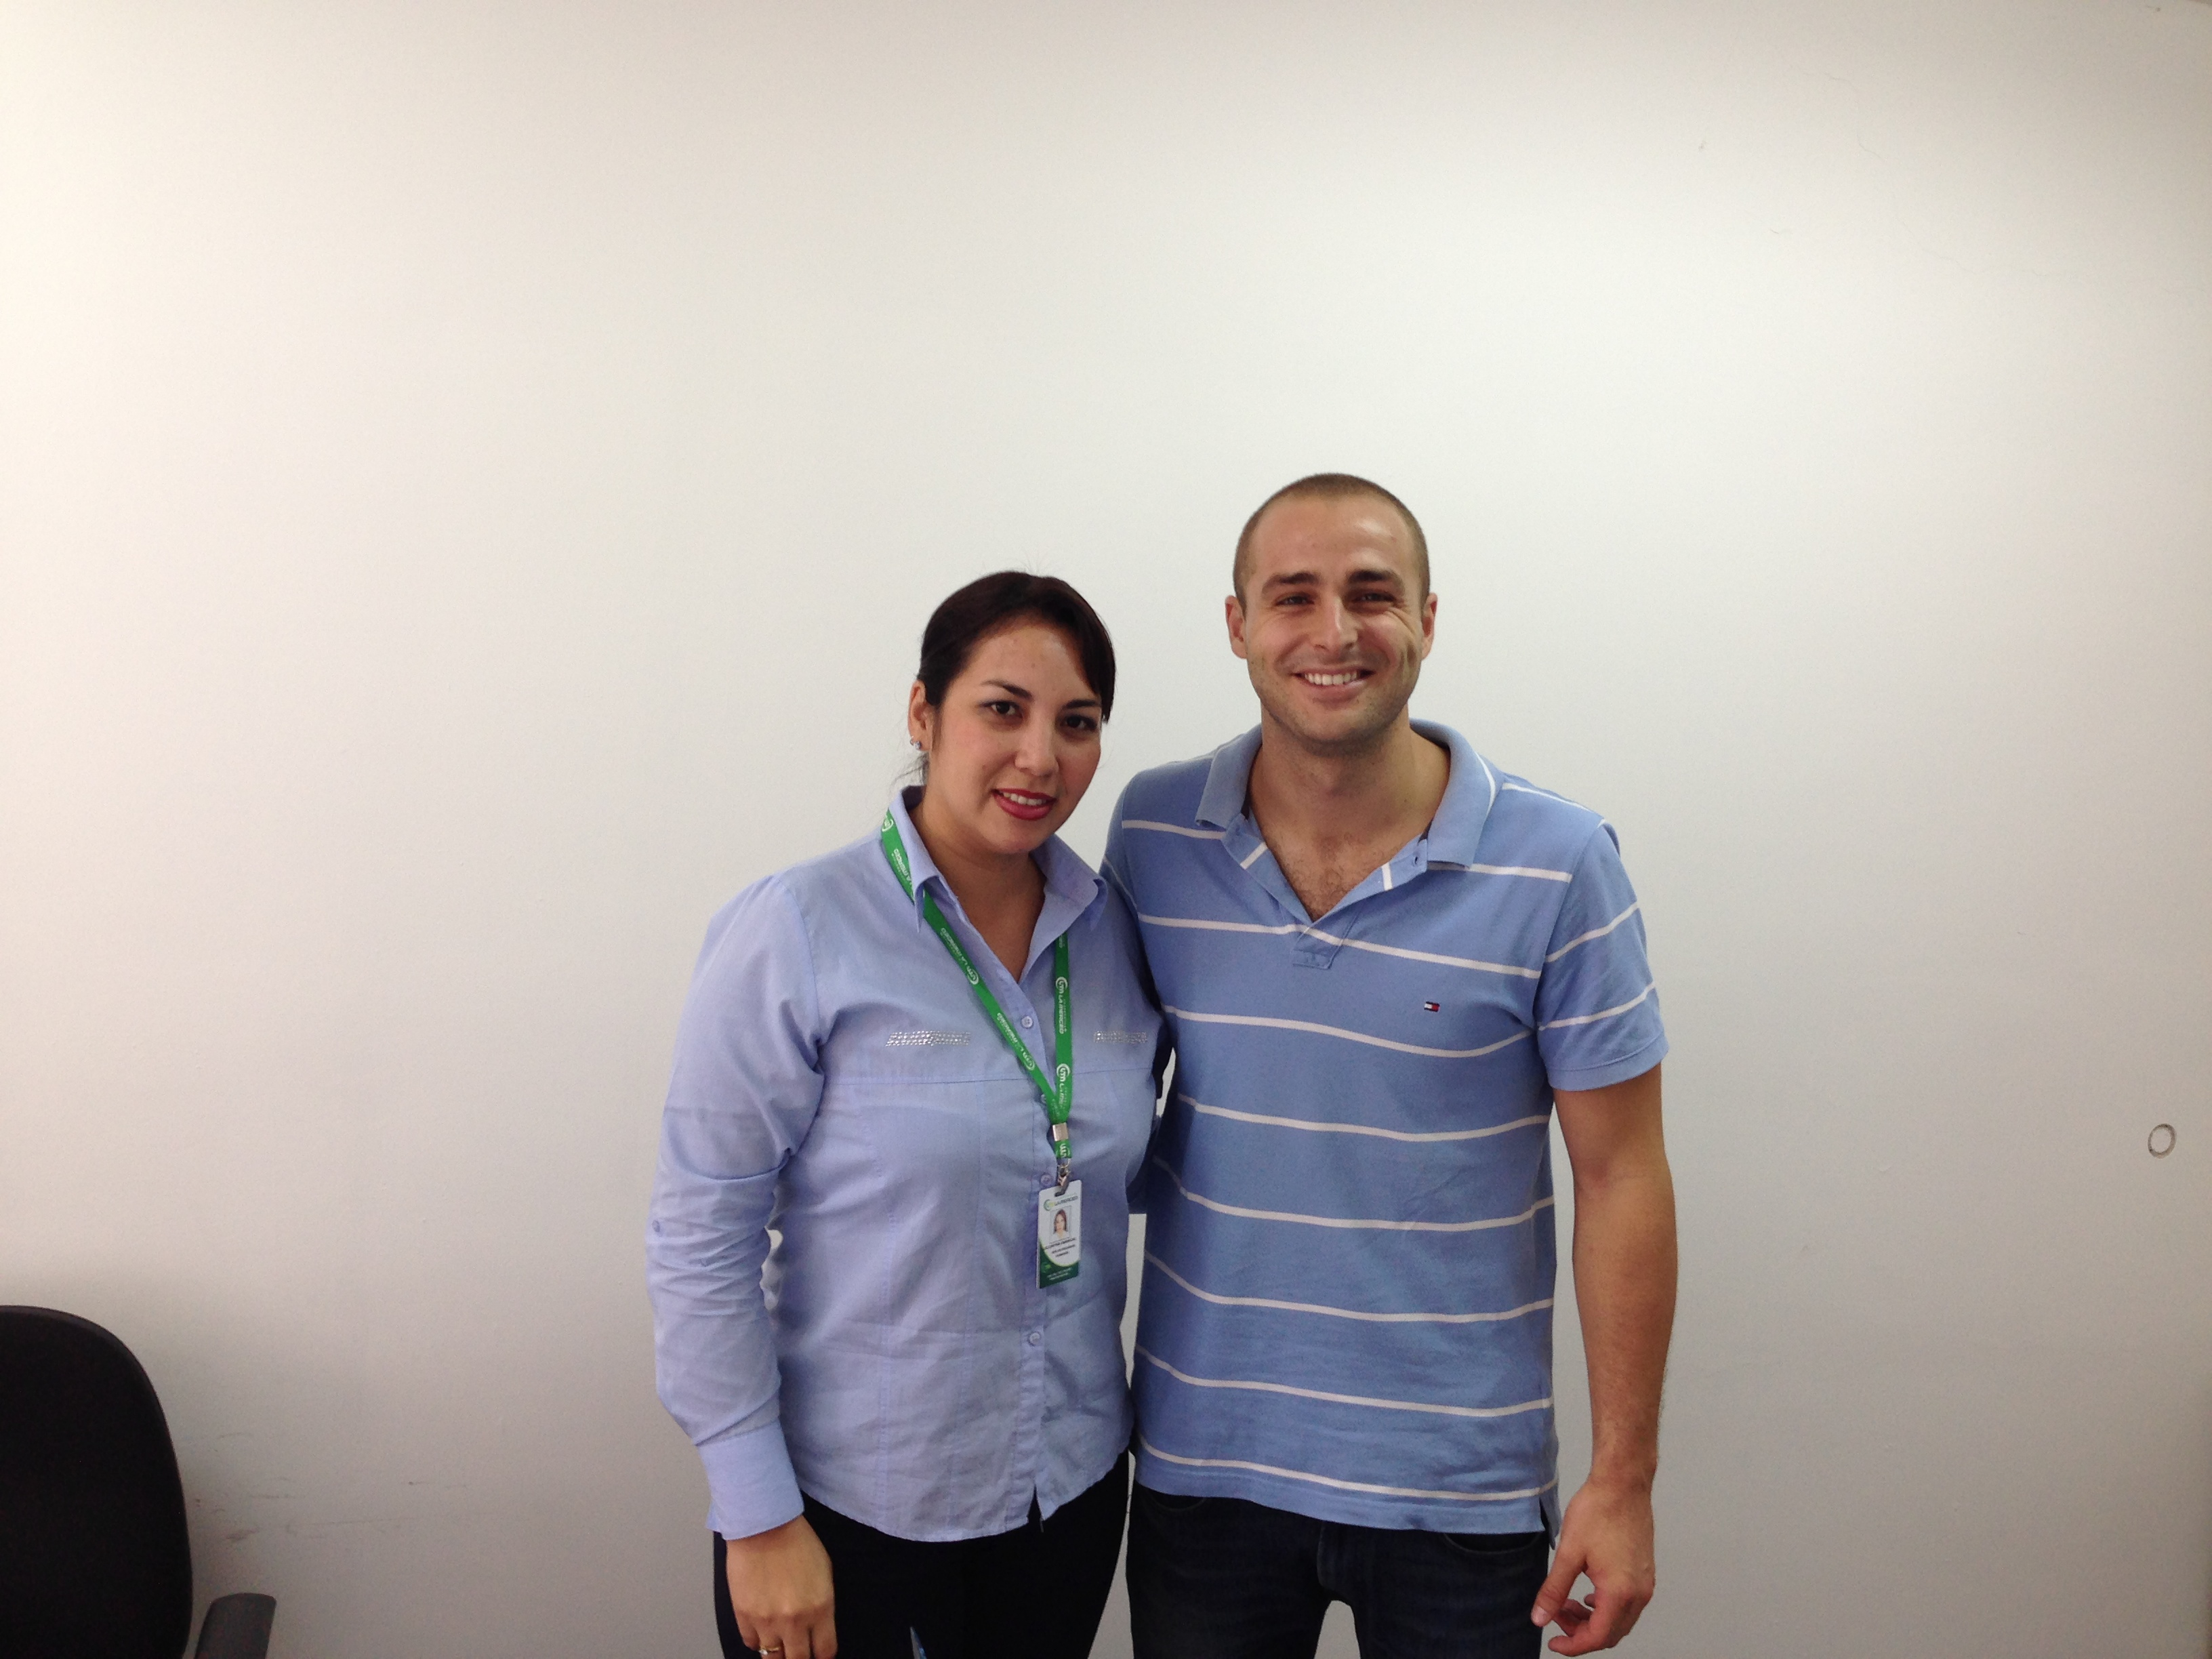 Con Cinthia Mariscal (Jefe de RRHH) de la Cooperativa La Merced